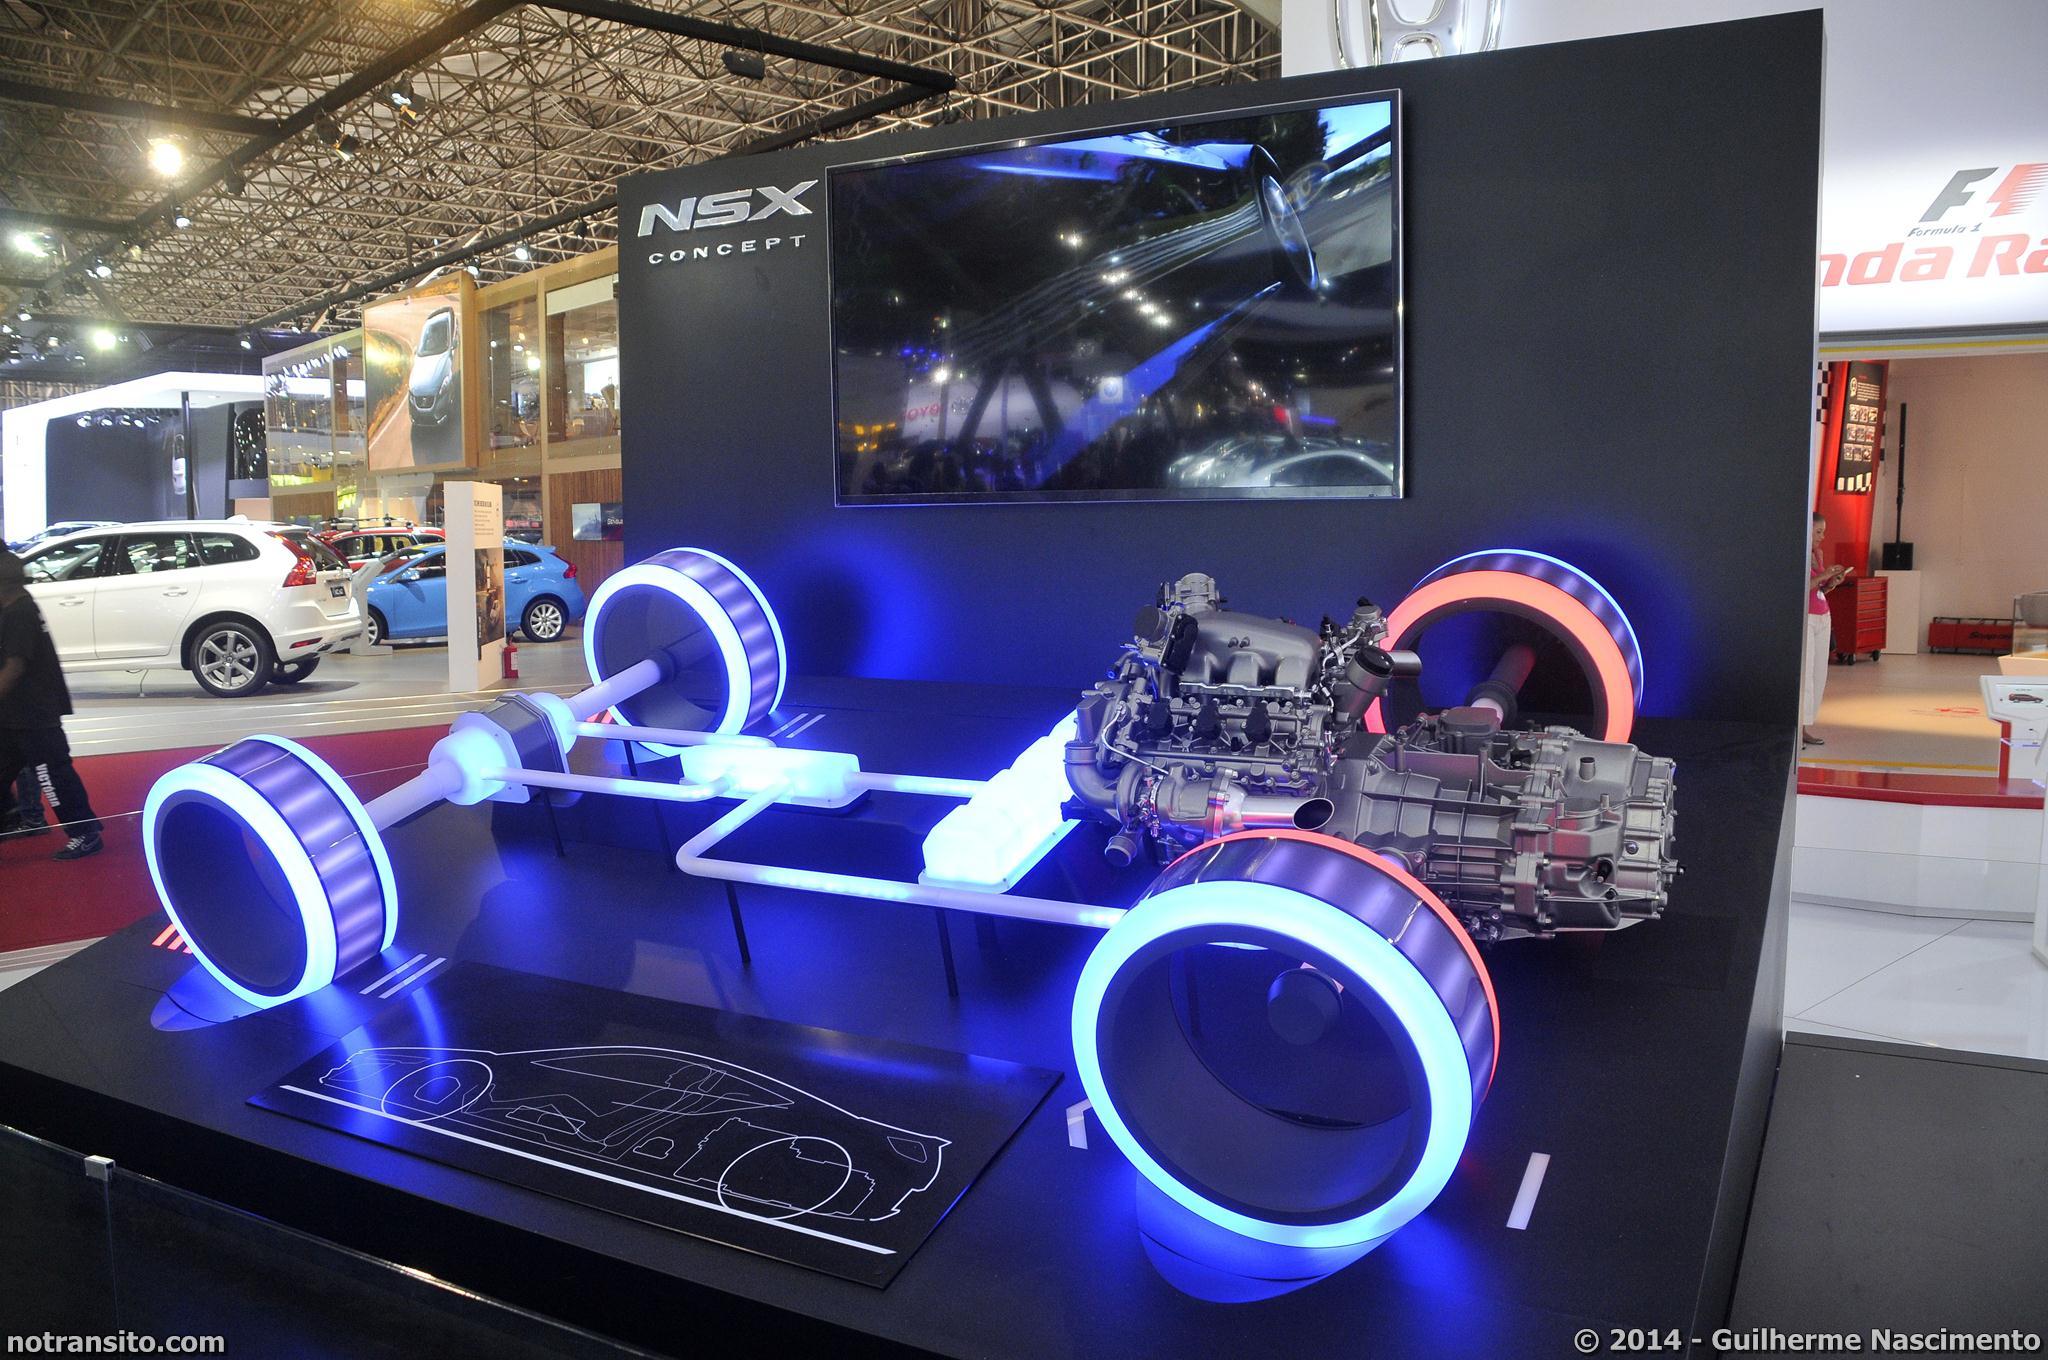 SH-AWD, Sport Hybrid Super Handling All Wheel Drive, Honda NSX Concept, NSX Concept, Salão do Automóvel de São Paulo 2014, 28º Salão do Automóvel de São Paulo